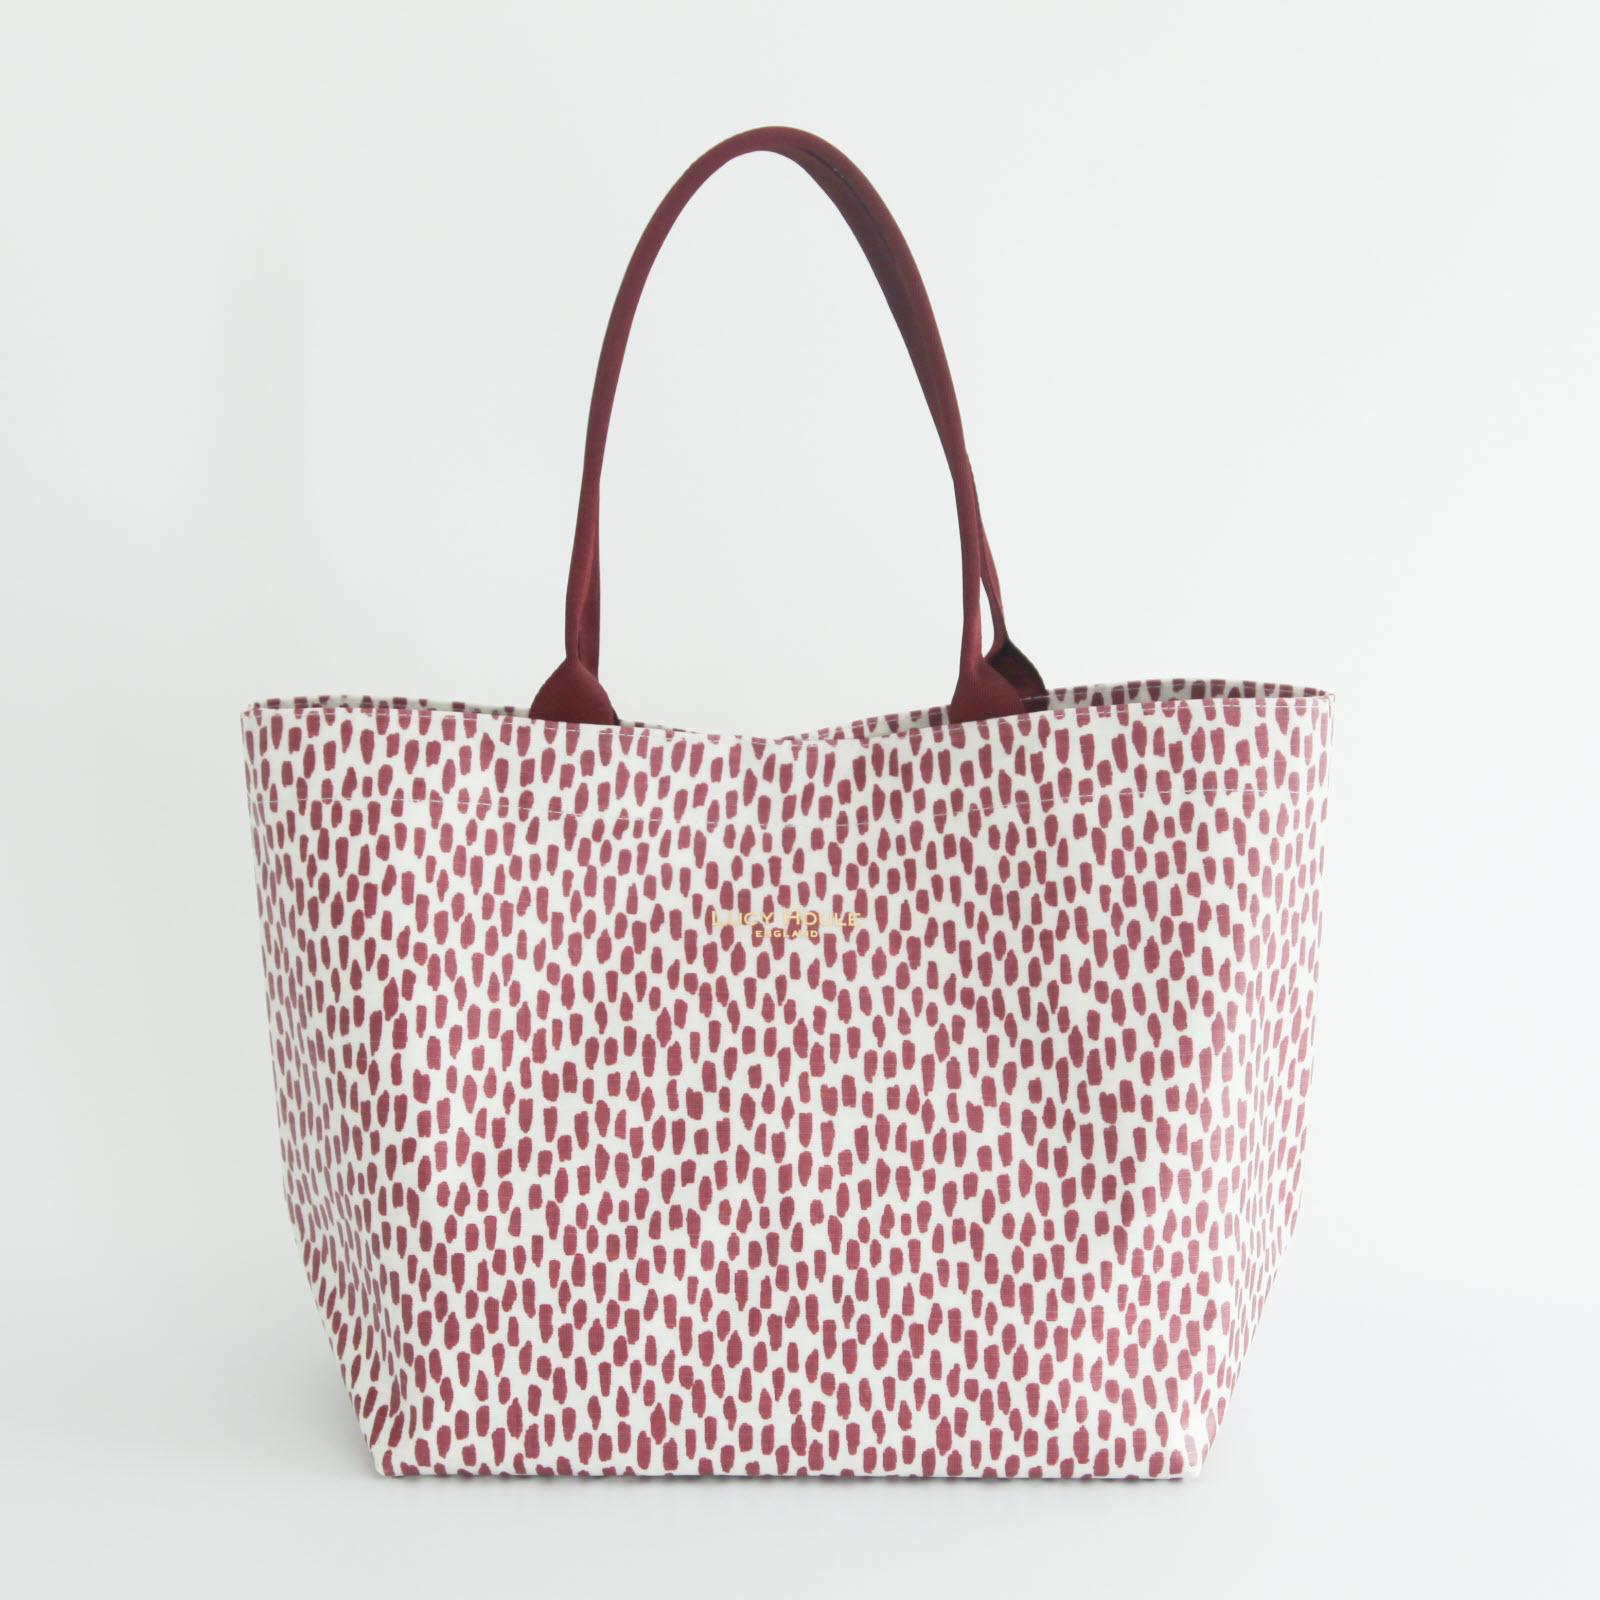 Mulberry Cobblestone Medium Tote Bag 'Limited Edition'